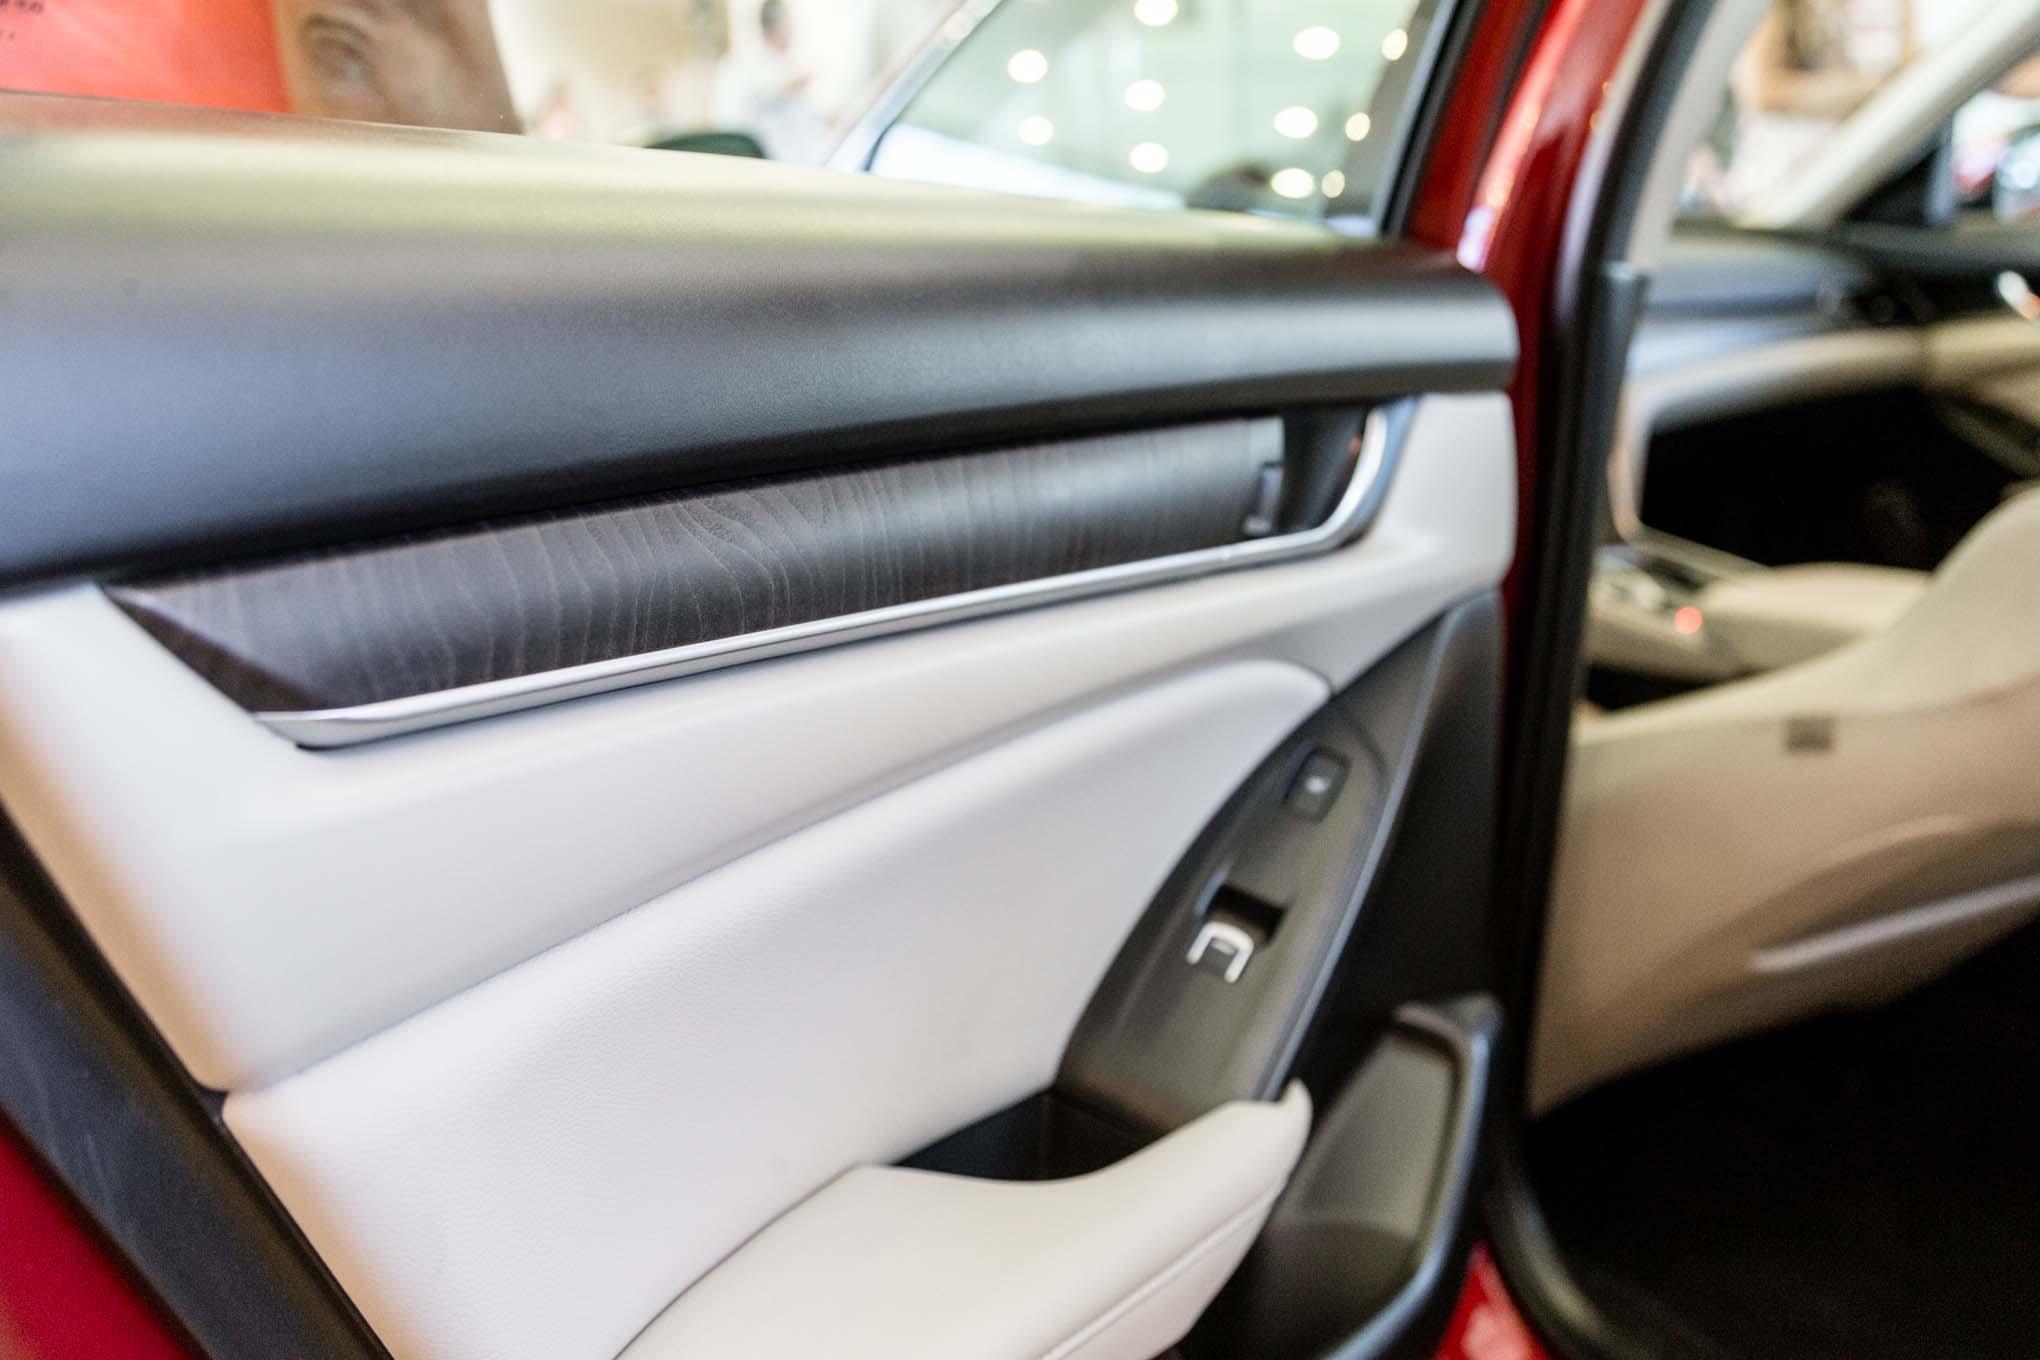 Honda Civic With Solar Panel